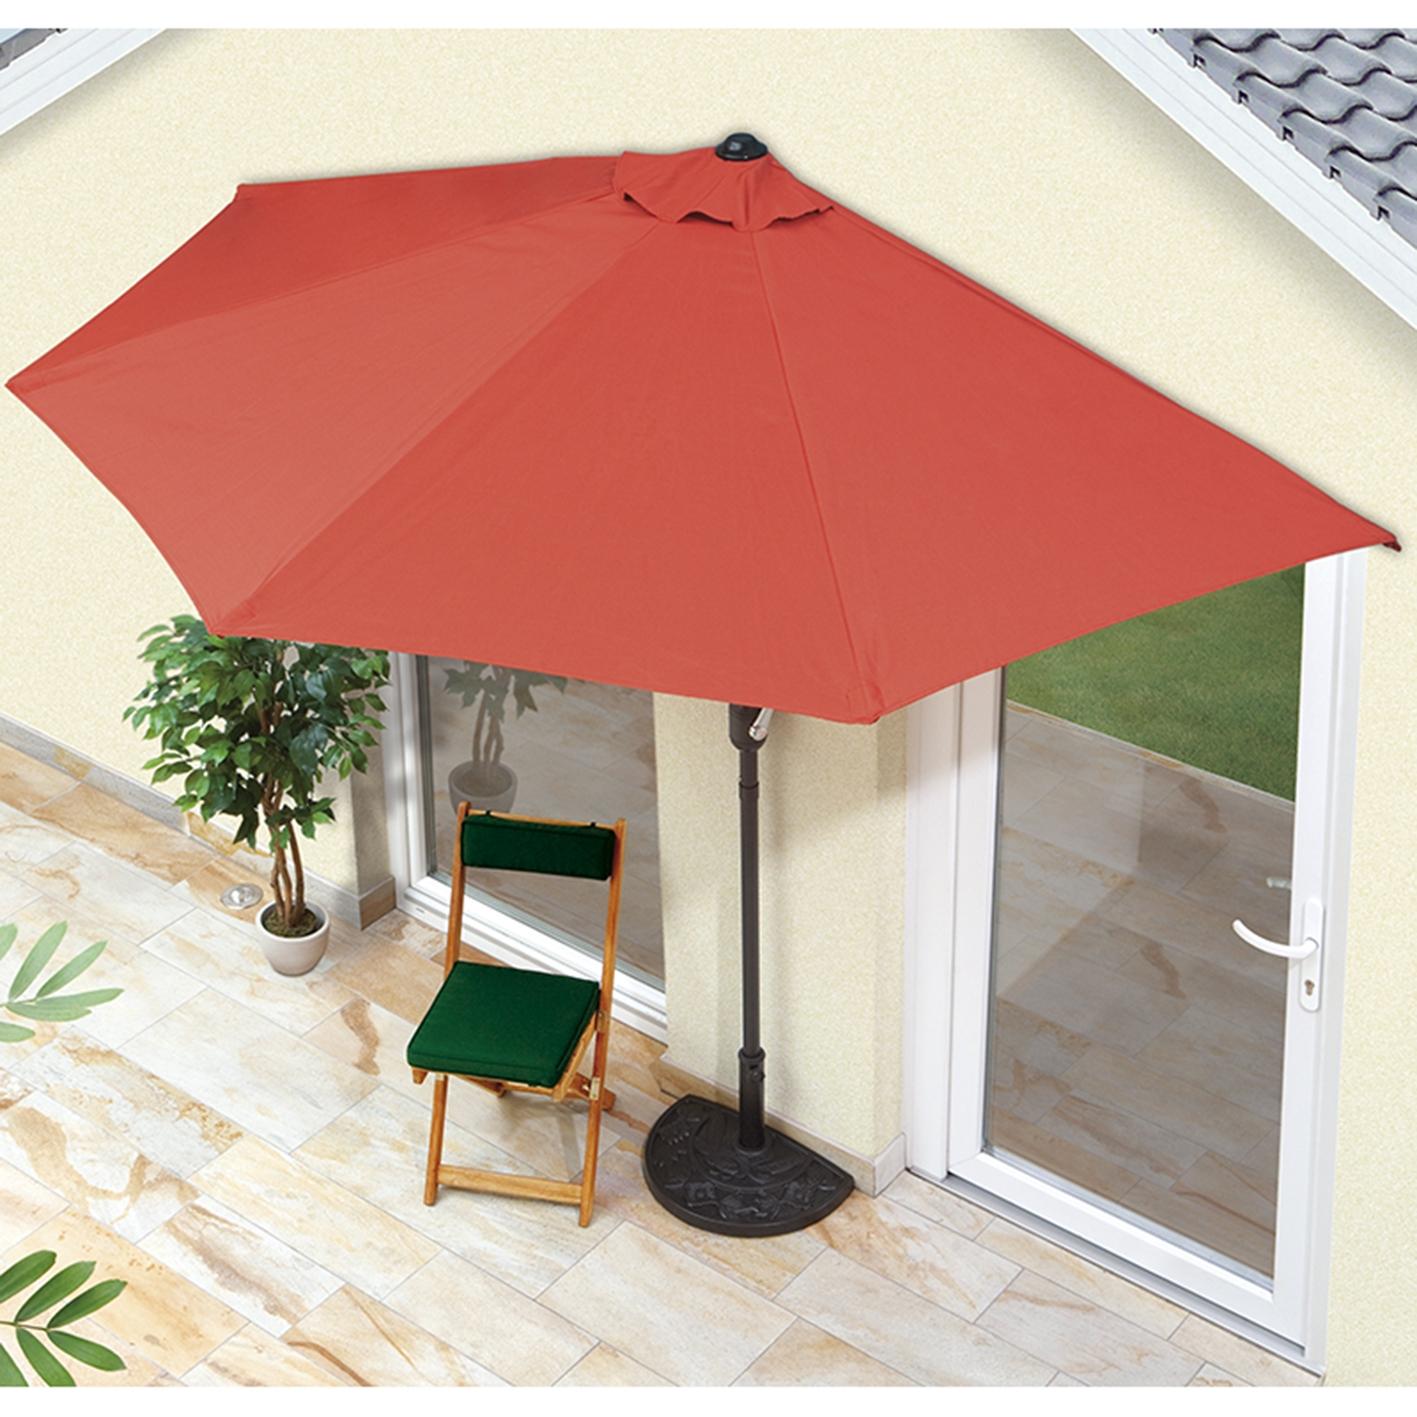 Turbo Sonnenschirm Balkon Hauswand Terassenschirm UV-Schutz inkl. Fuß MJ65